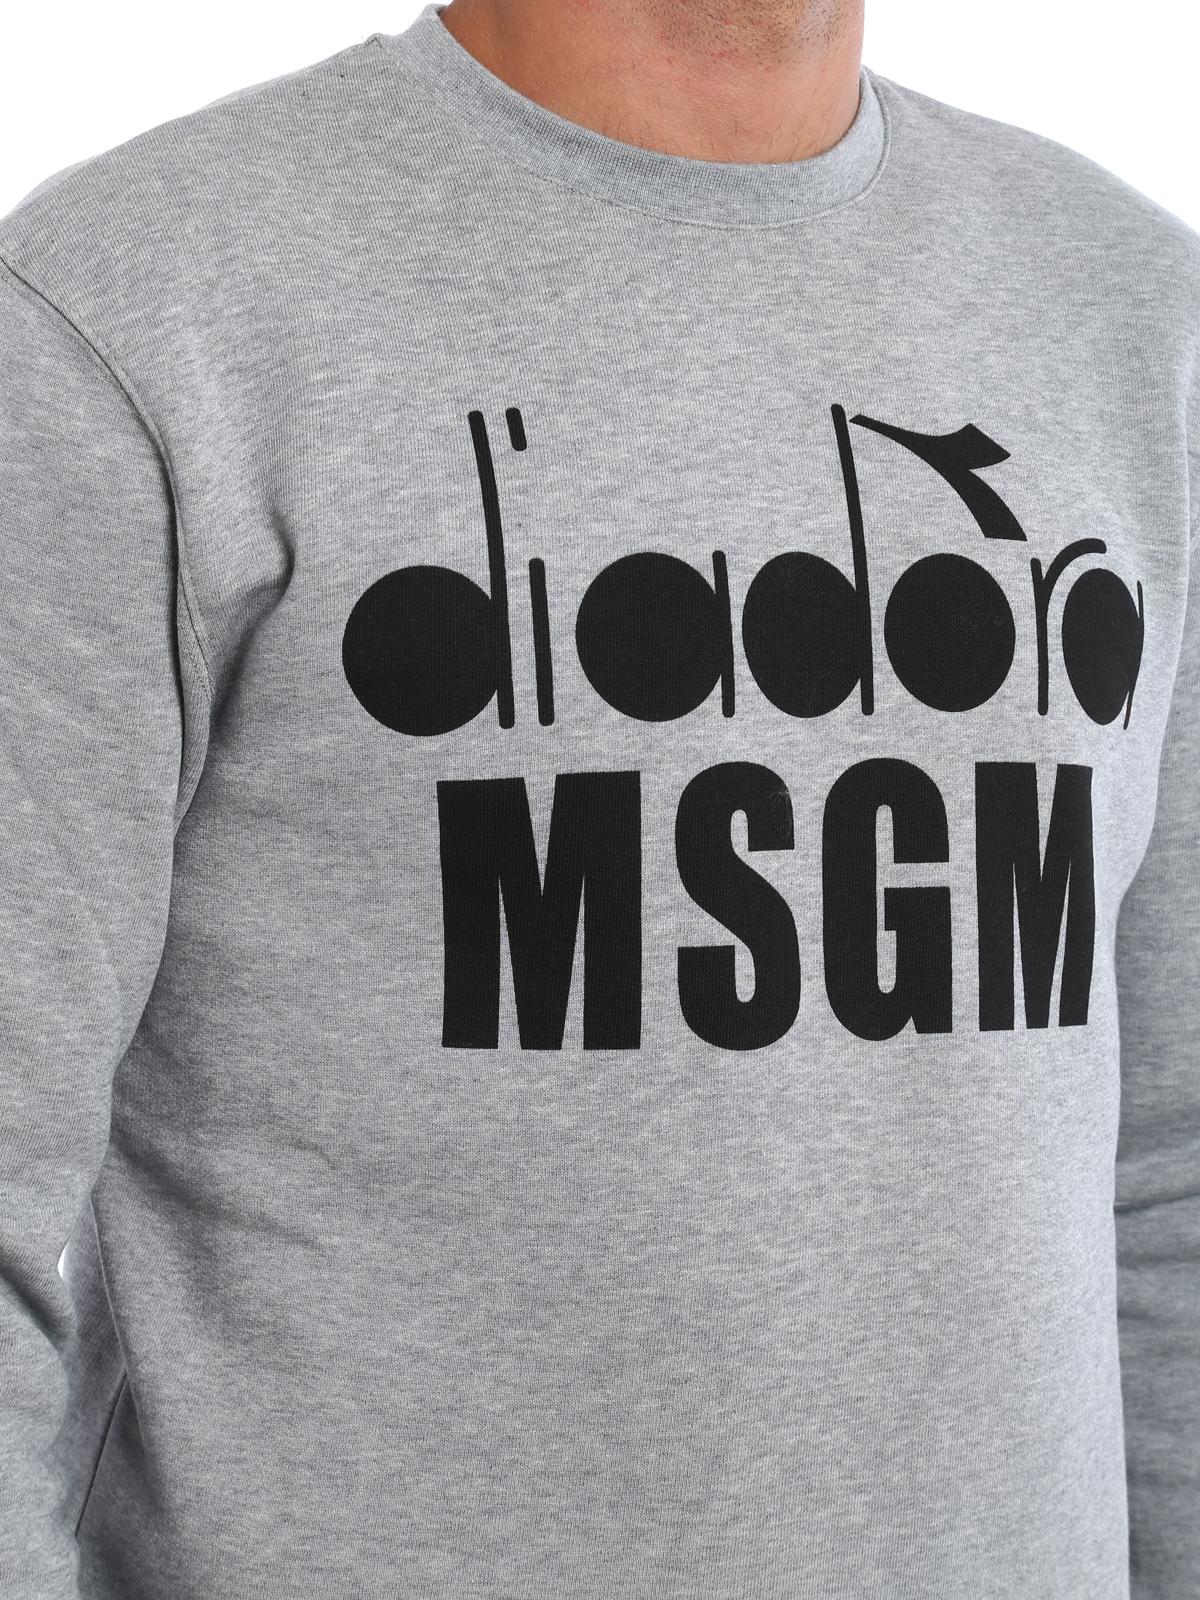 Msgm Diadora E Maglie M Felpe g 2340mm30117477796 s m Felpa q166XgwI